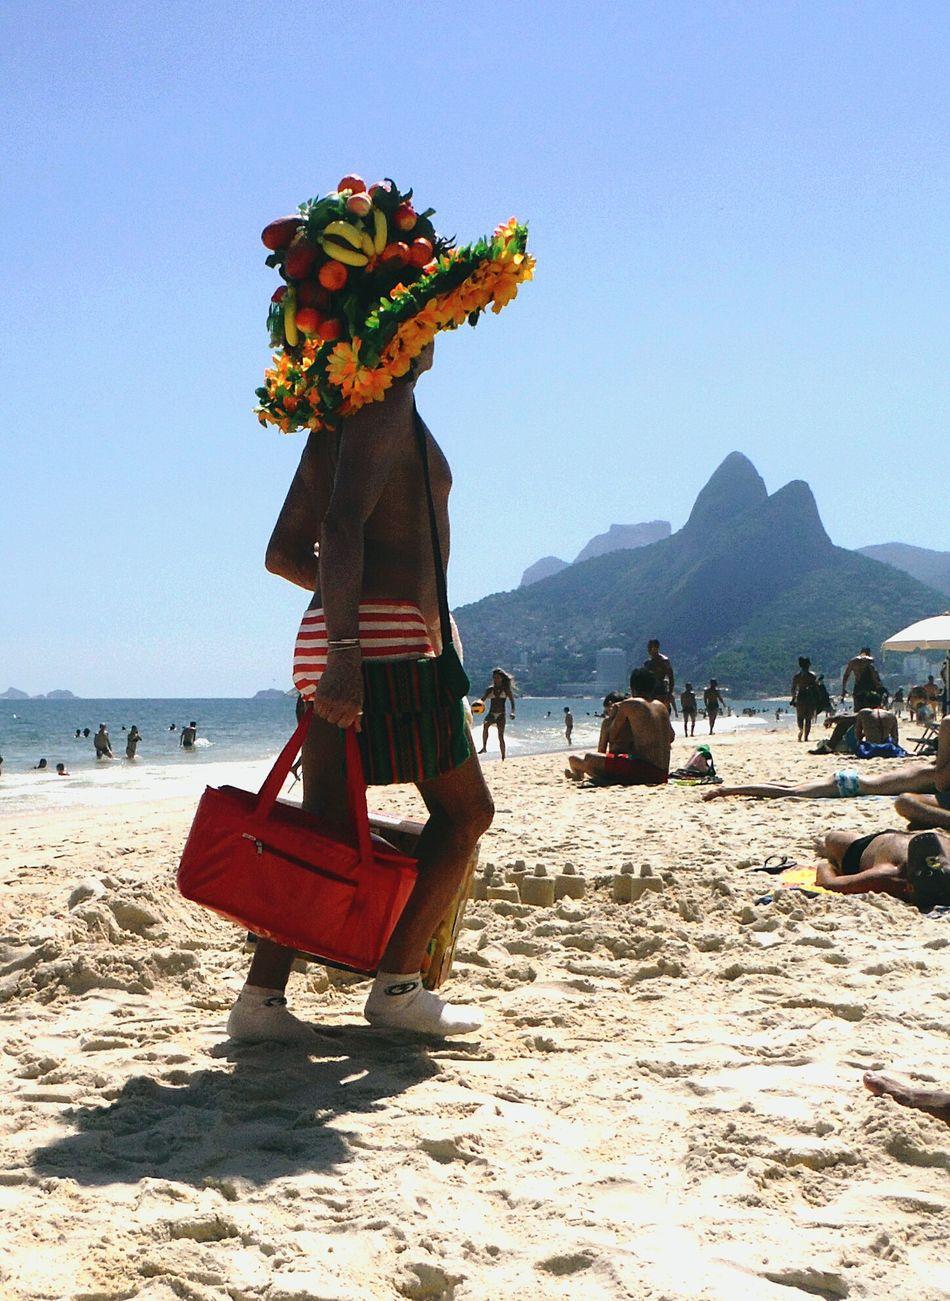 Brazil Brasil Ipanema Beach Ipanema Rio De Janeiro Eyeem Fotos Collection⛵ Rio De Janeiro Vendor Selling Refreshment Beach Sunny Day Hat Friut Big Hat